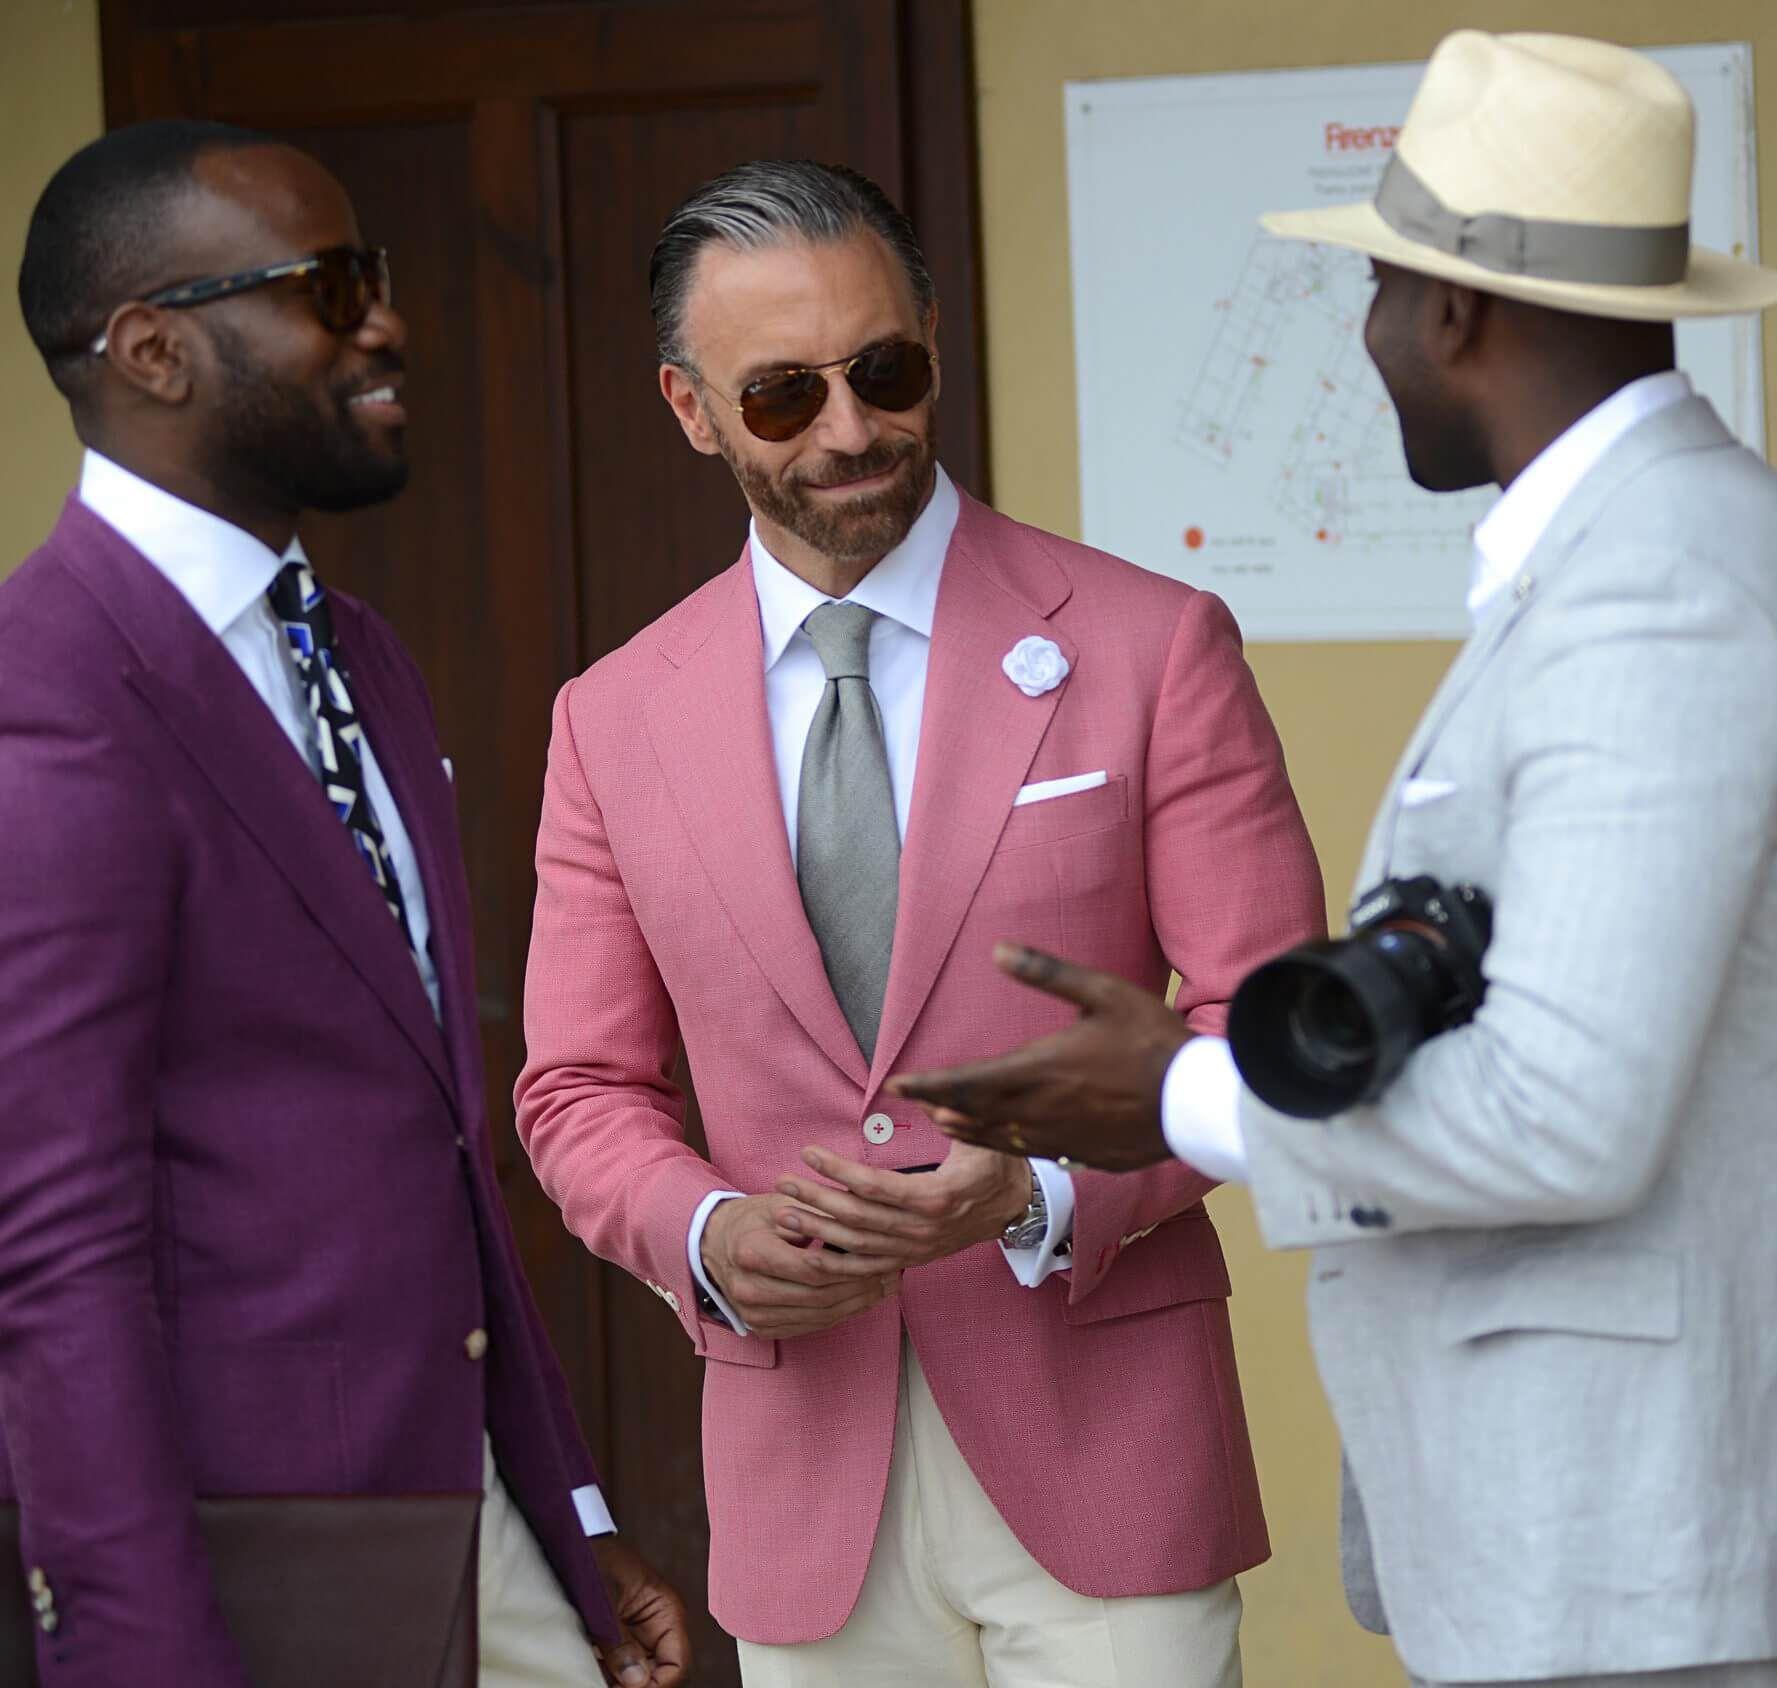 f57e4d09c623 Real Men Wear Pink in 2019 | Things to Wear | Blazer outfits men ...